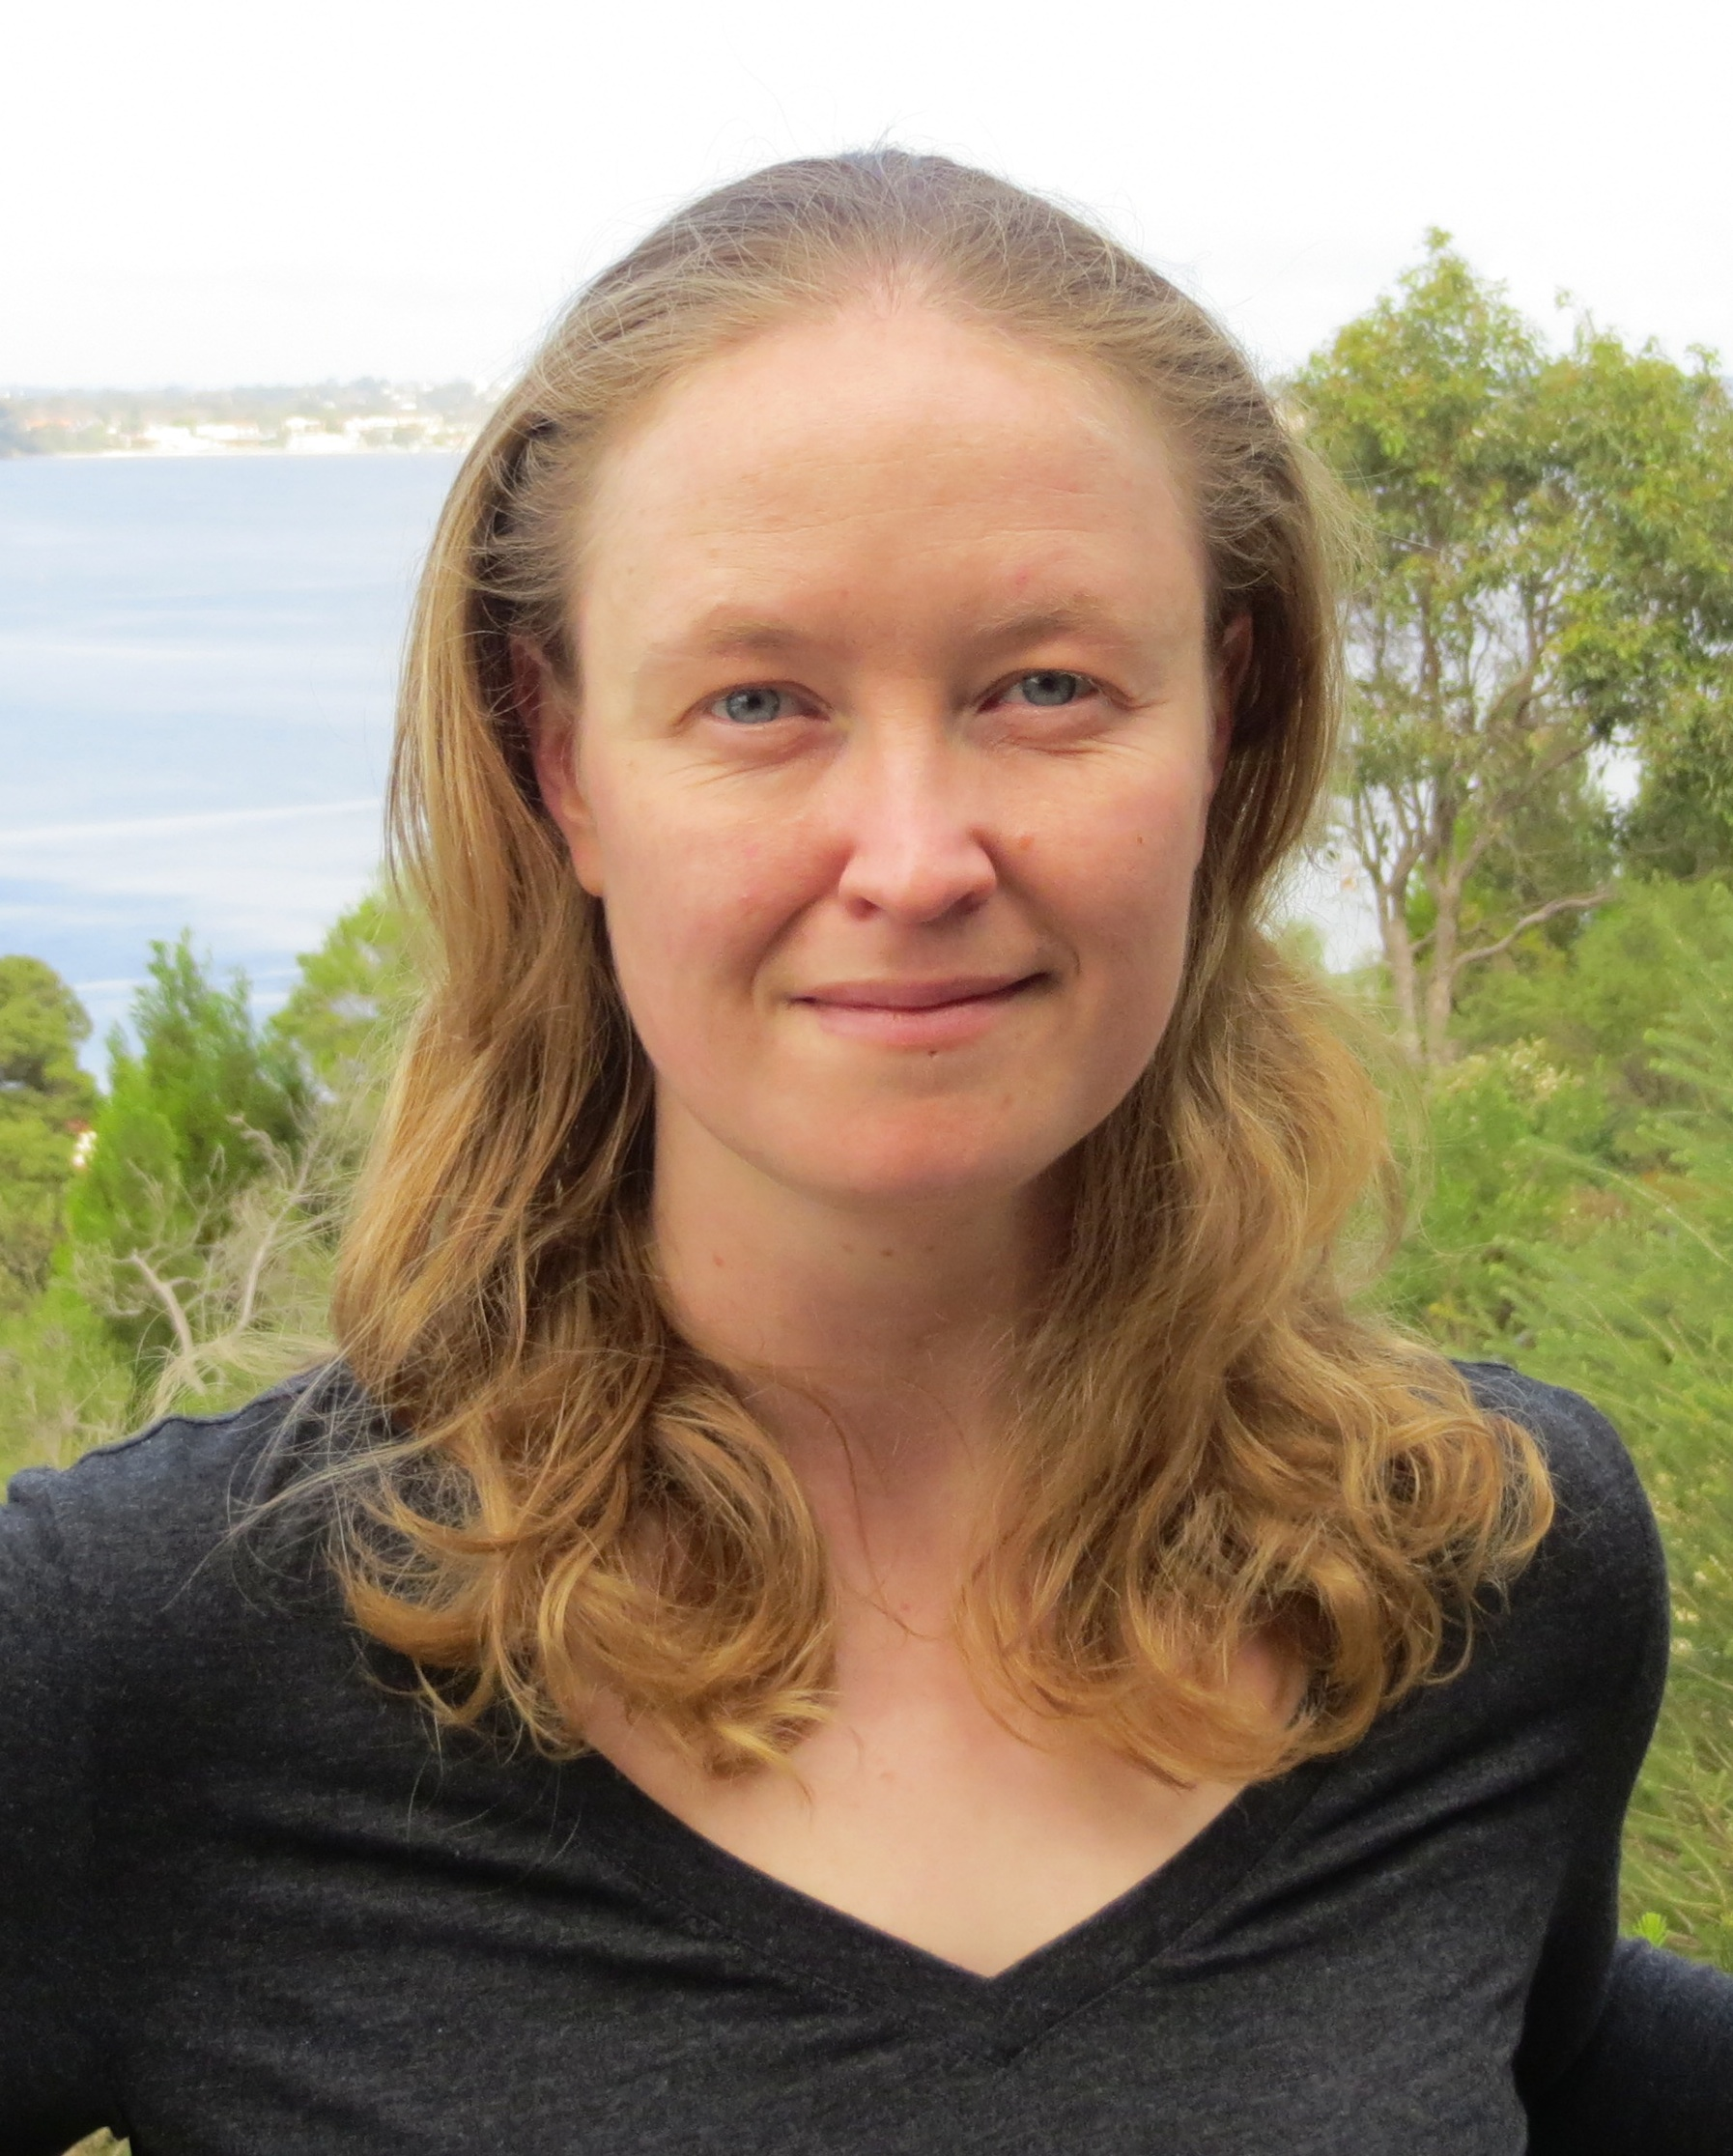 Julie Prytulak